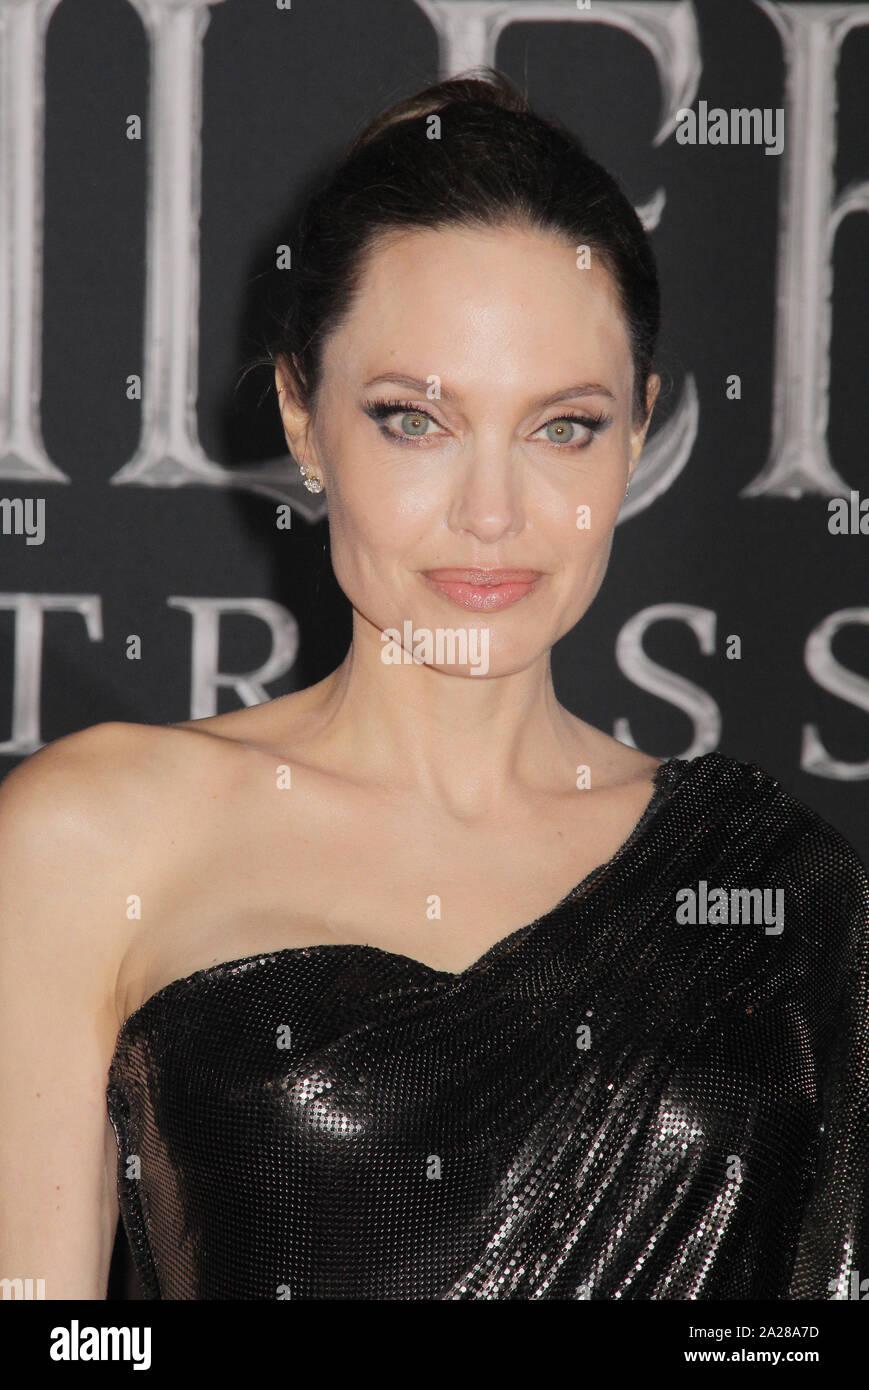 Angelina Jolie Movie Poster Usa Stock Photos Angelina